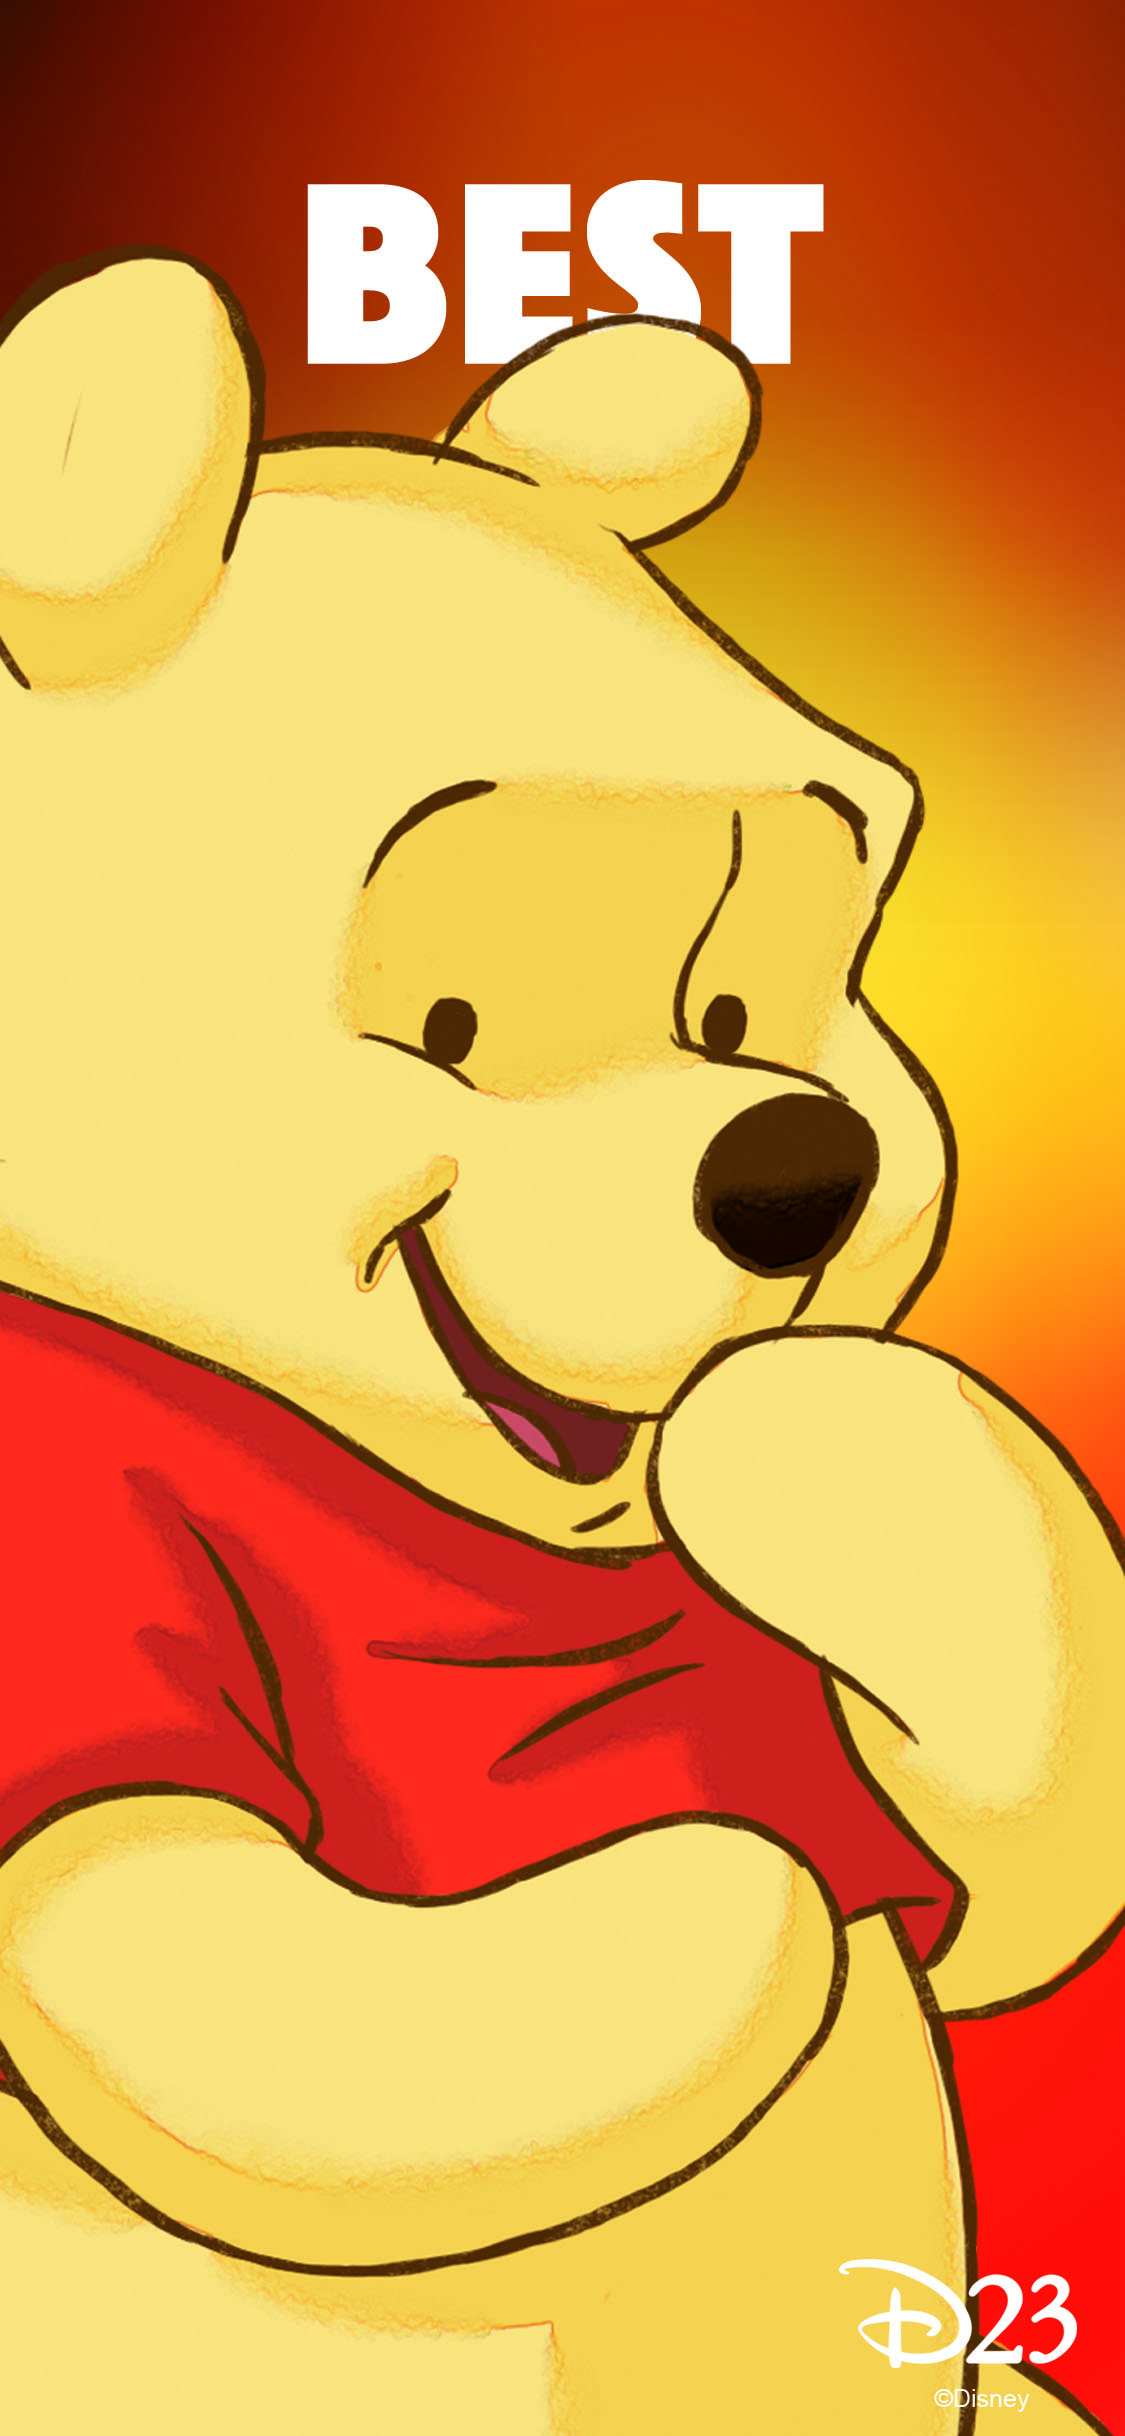 Best Friends phone wallpaper - Pooh